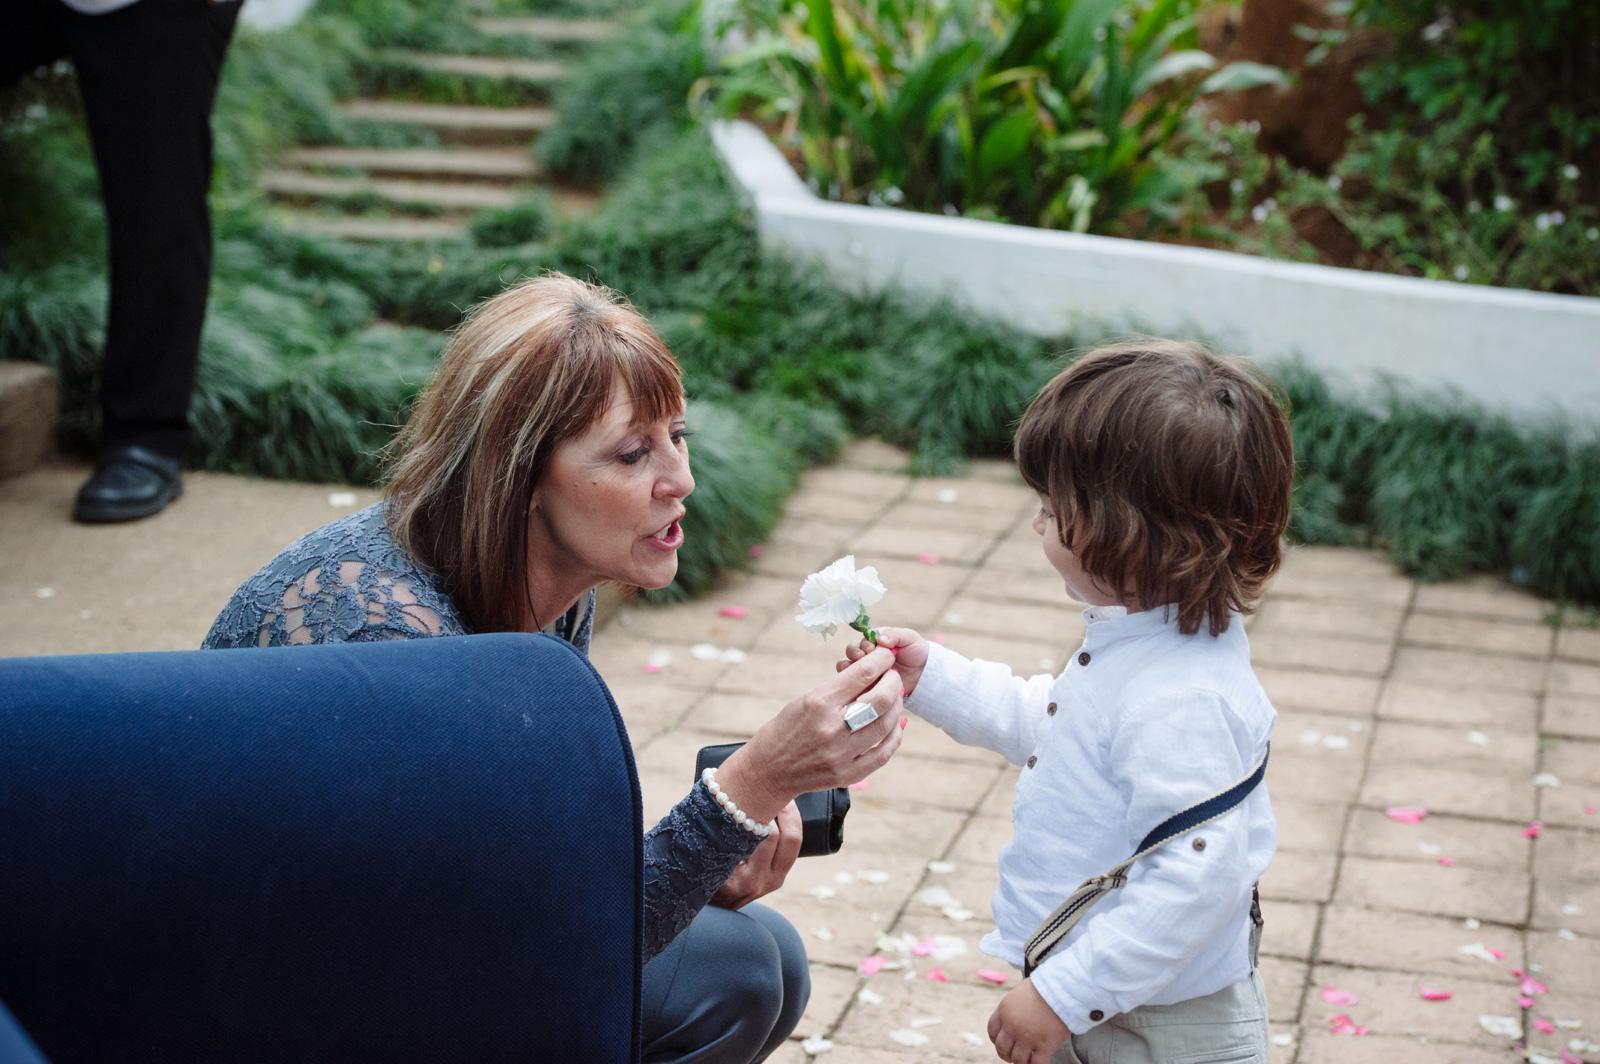 boy giving woman a flower